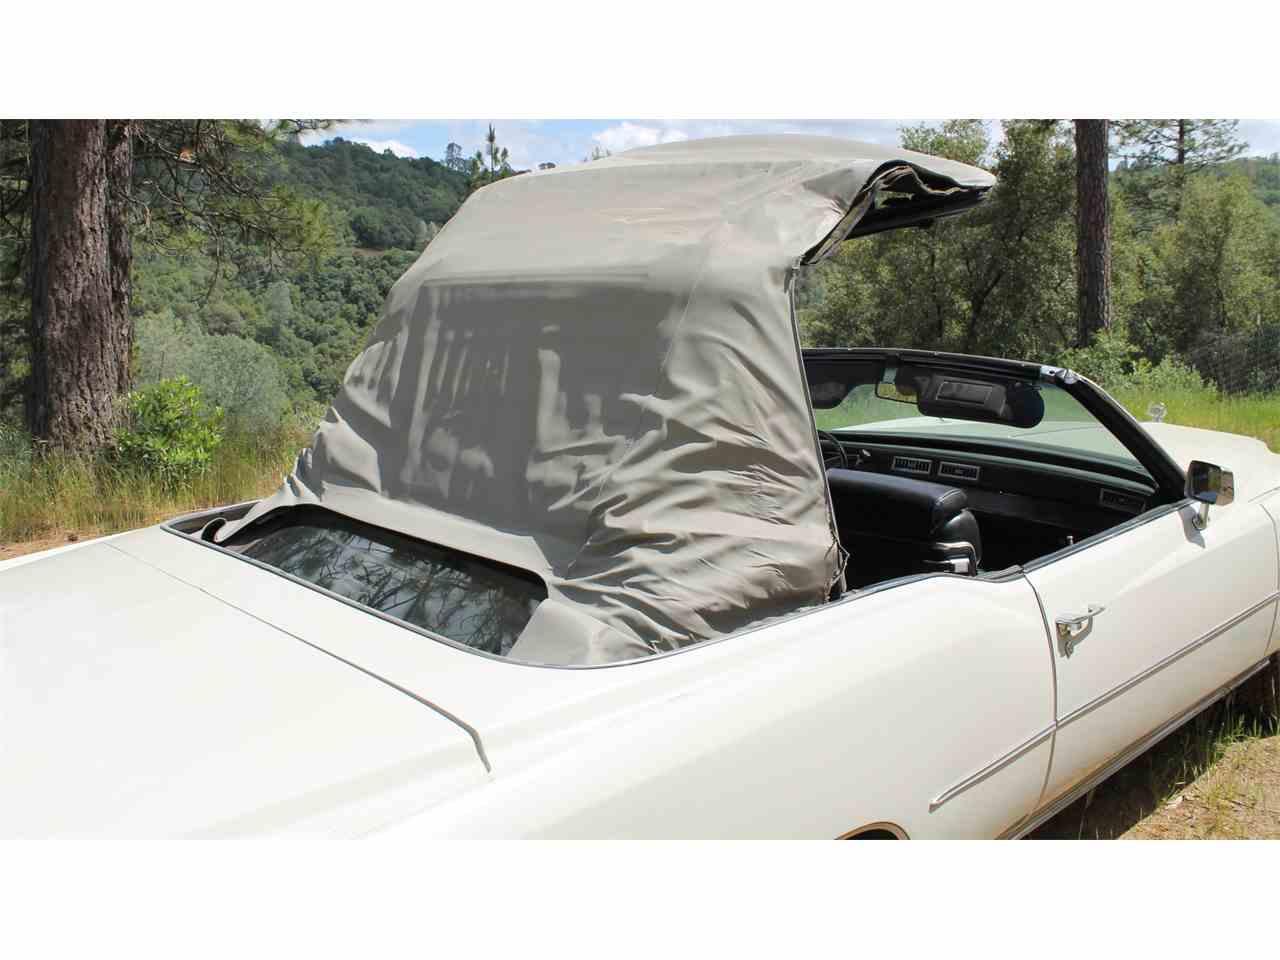 Large Picture of '75 Eldorado located in Sutter Creek California - $10,000.00 - I5ZP